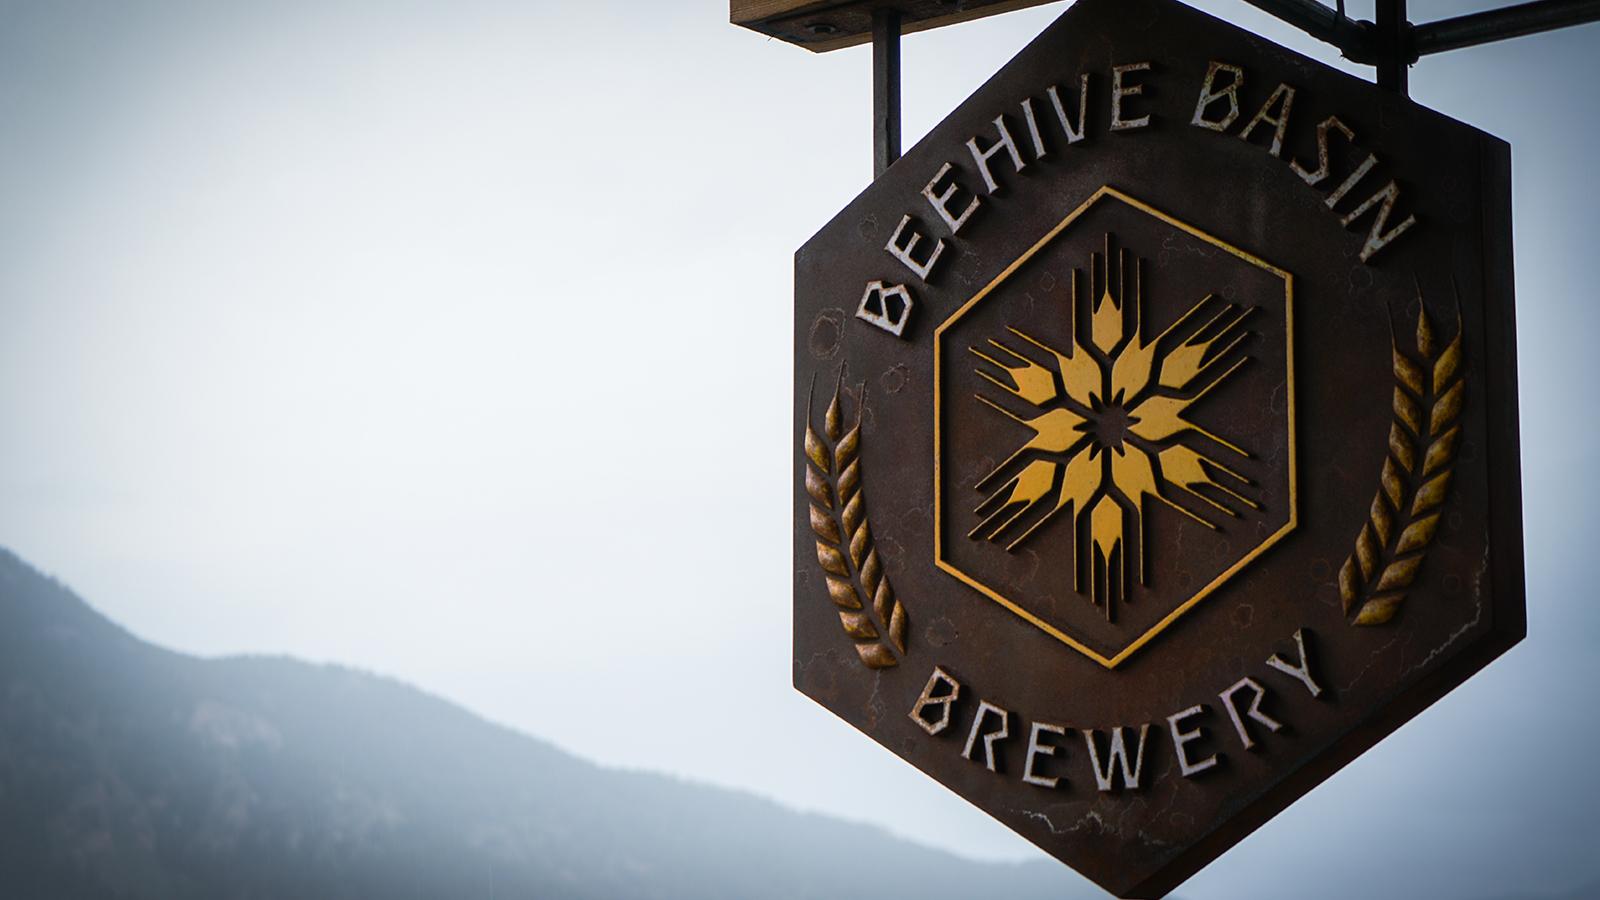 Beehive Basin Brewery